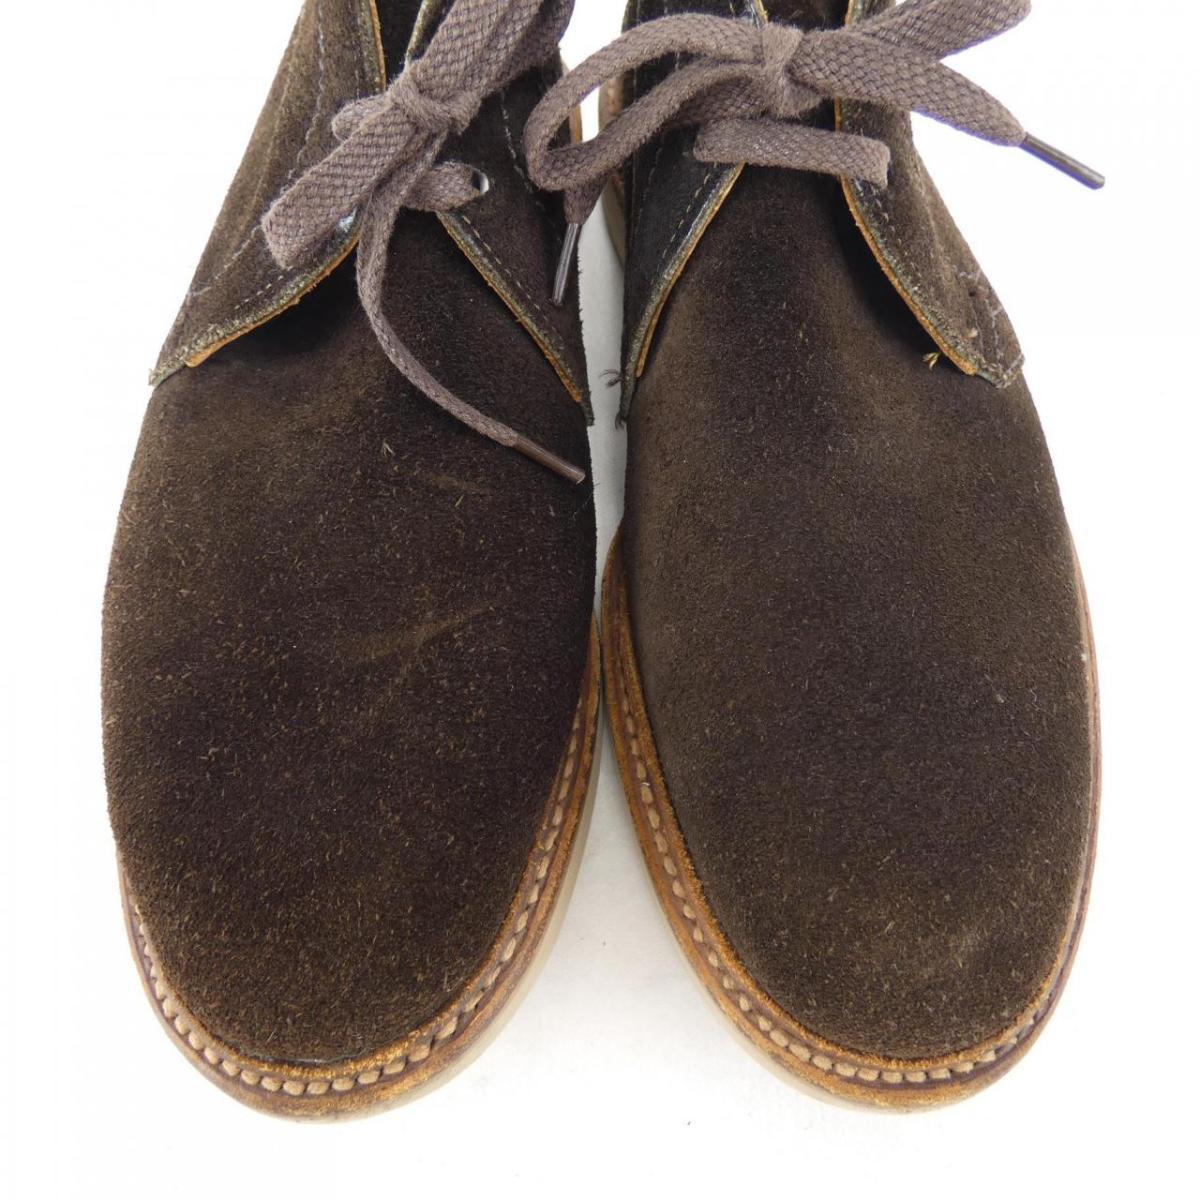 Run Bounce Sneaker by Porsche Design | Mens fashion shoes